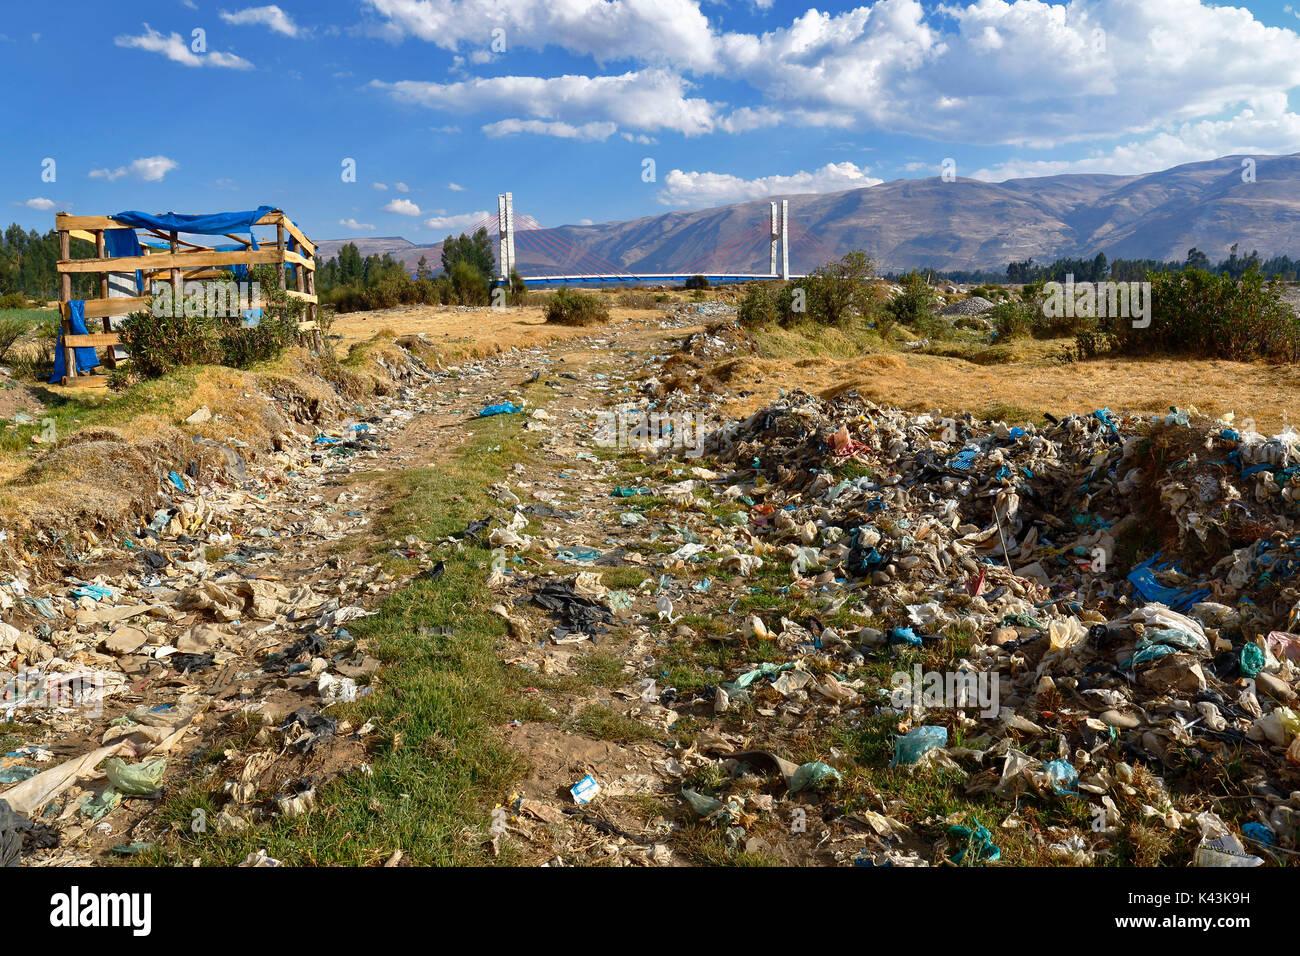 La ribera, Huancayo. August 23, 2017 - Uncontrolled landfill on the Mantaro River - Stock Image